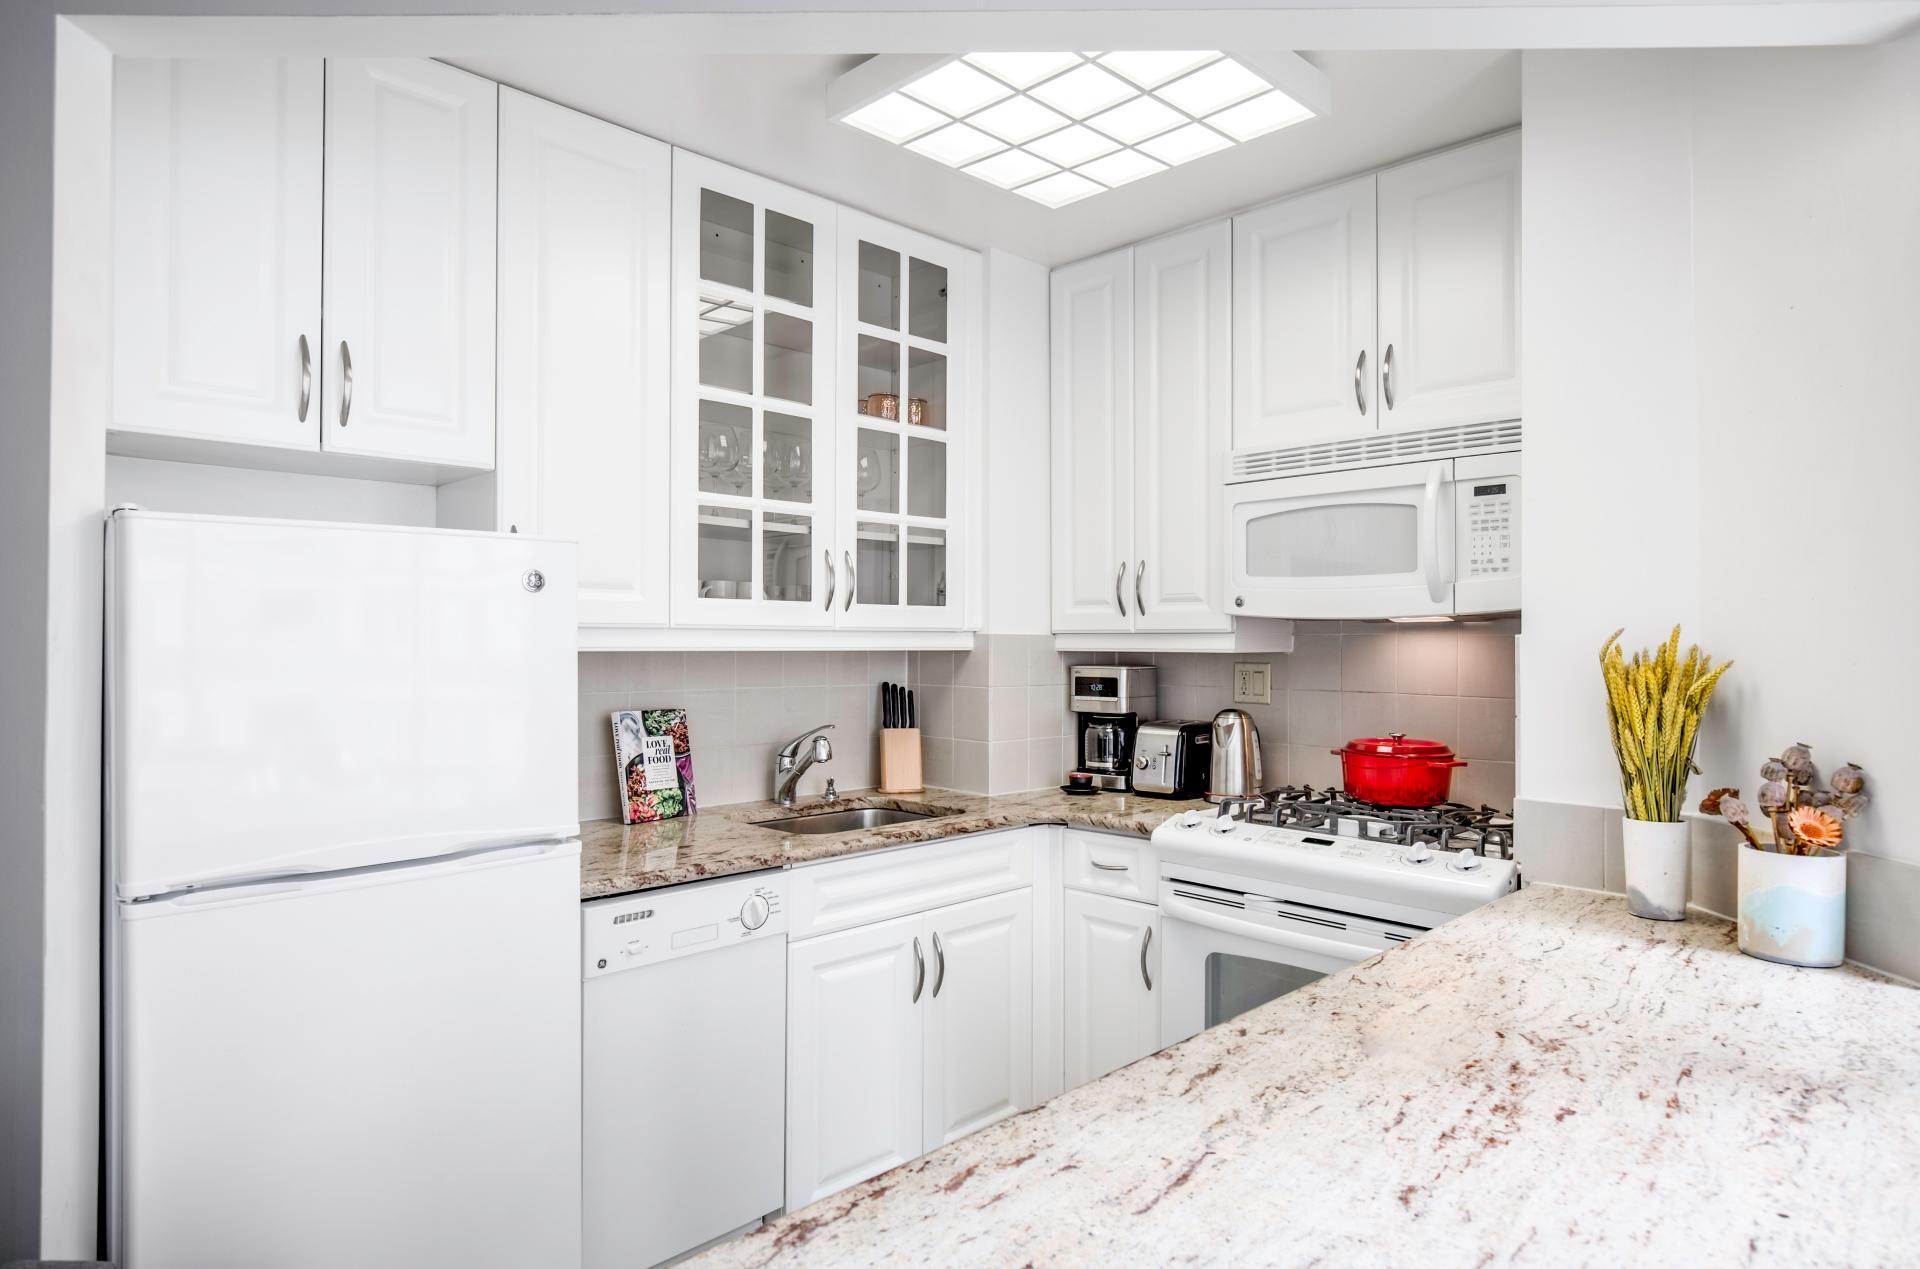 Kitchen at Kips Bay Court III Apartment